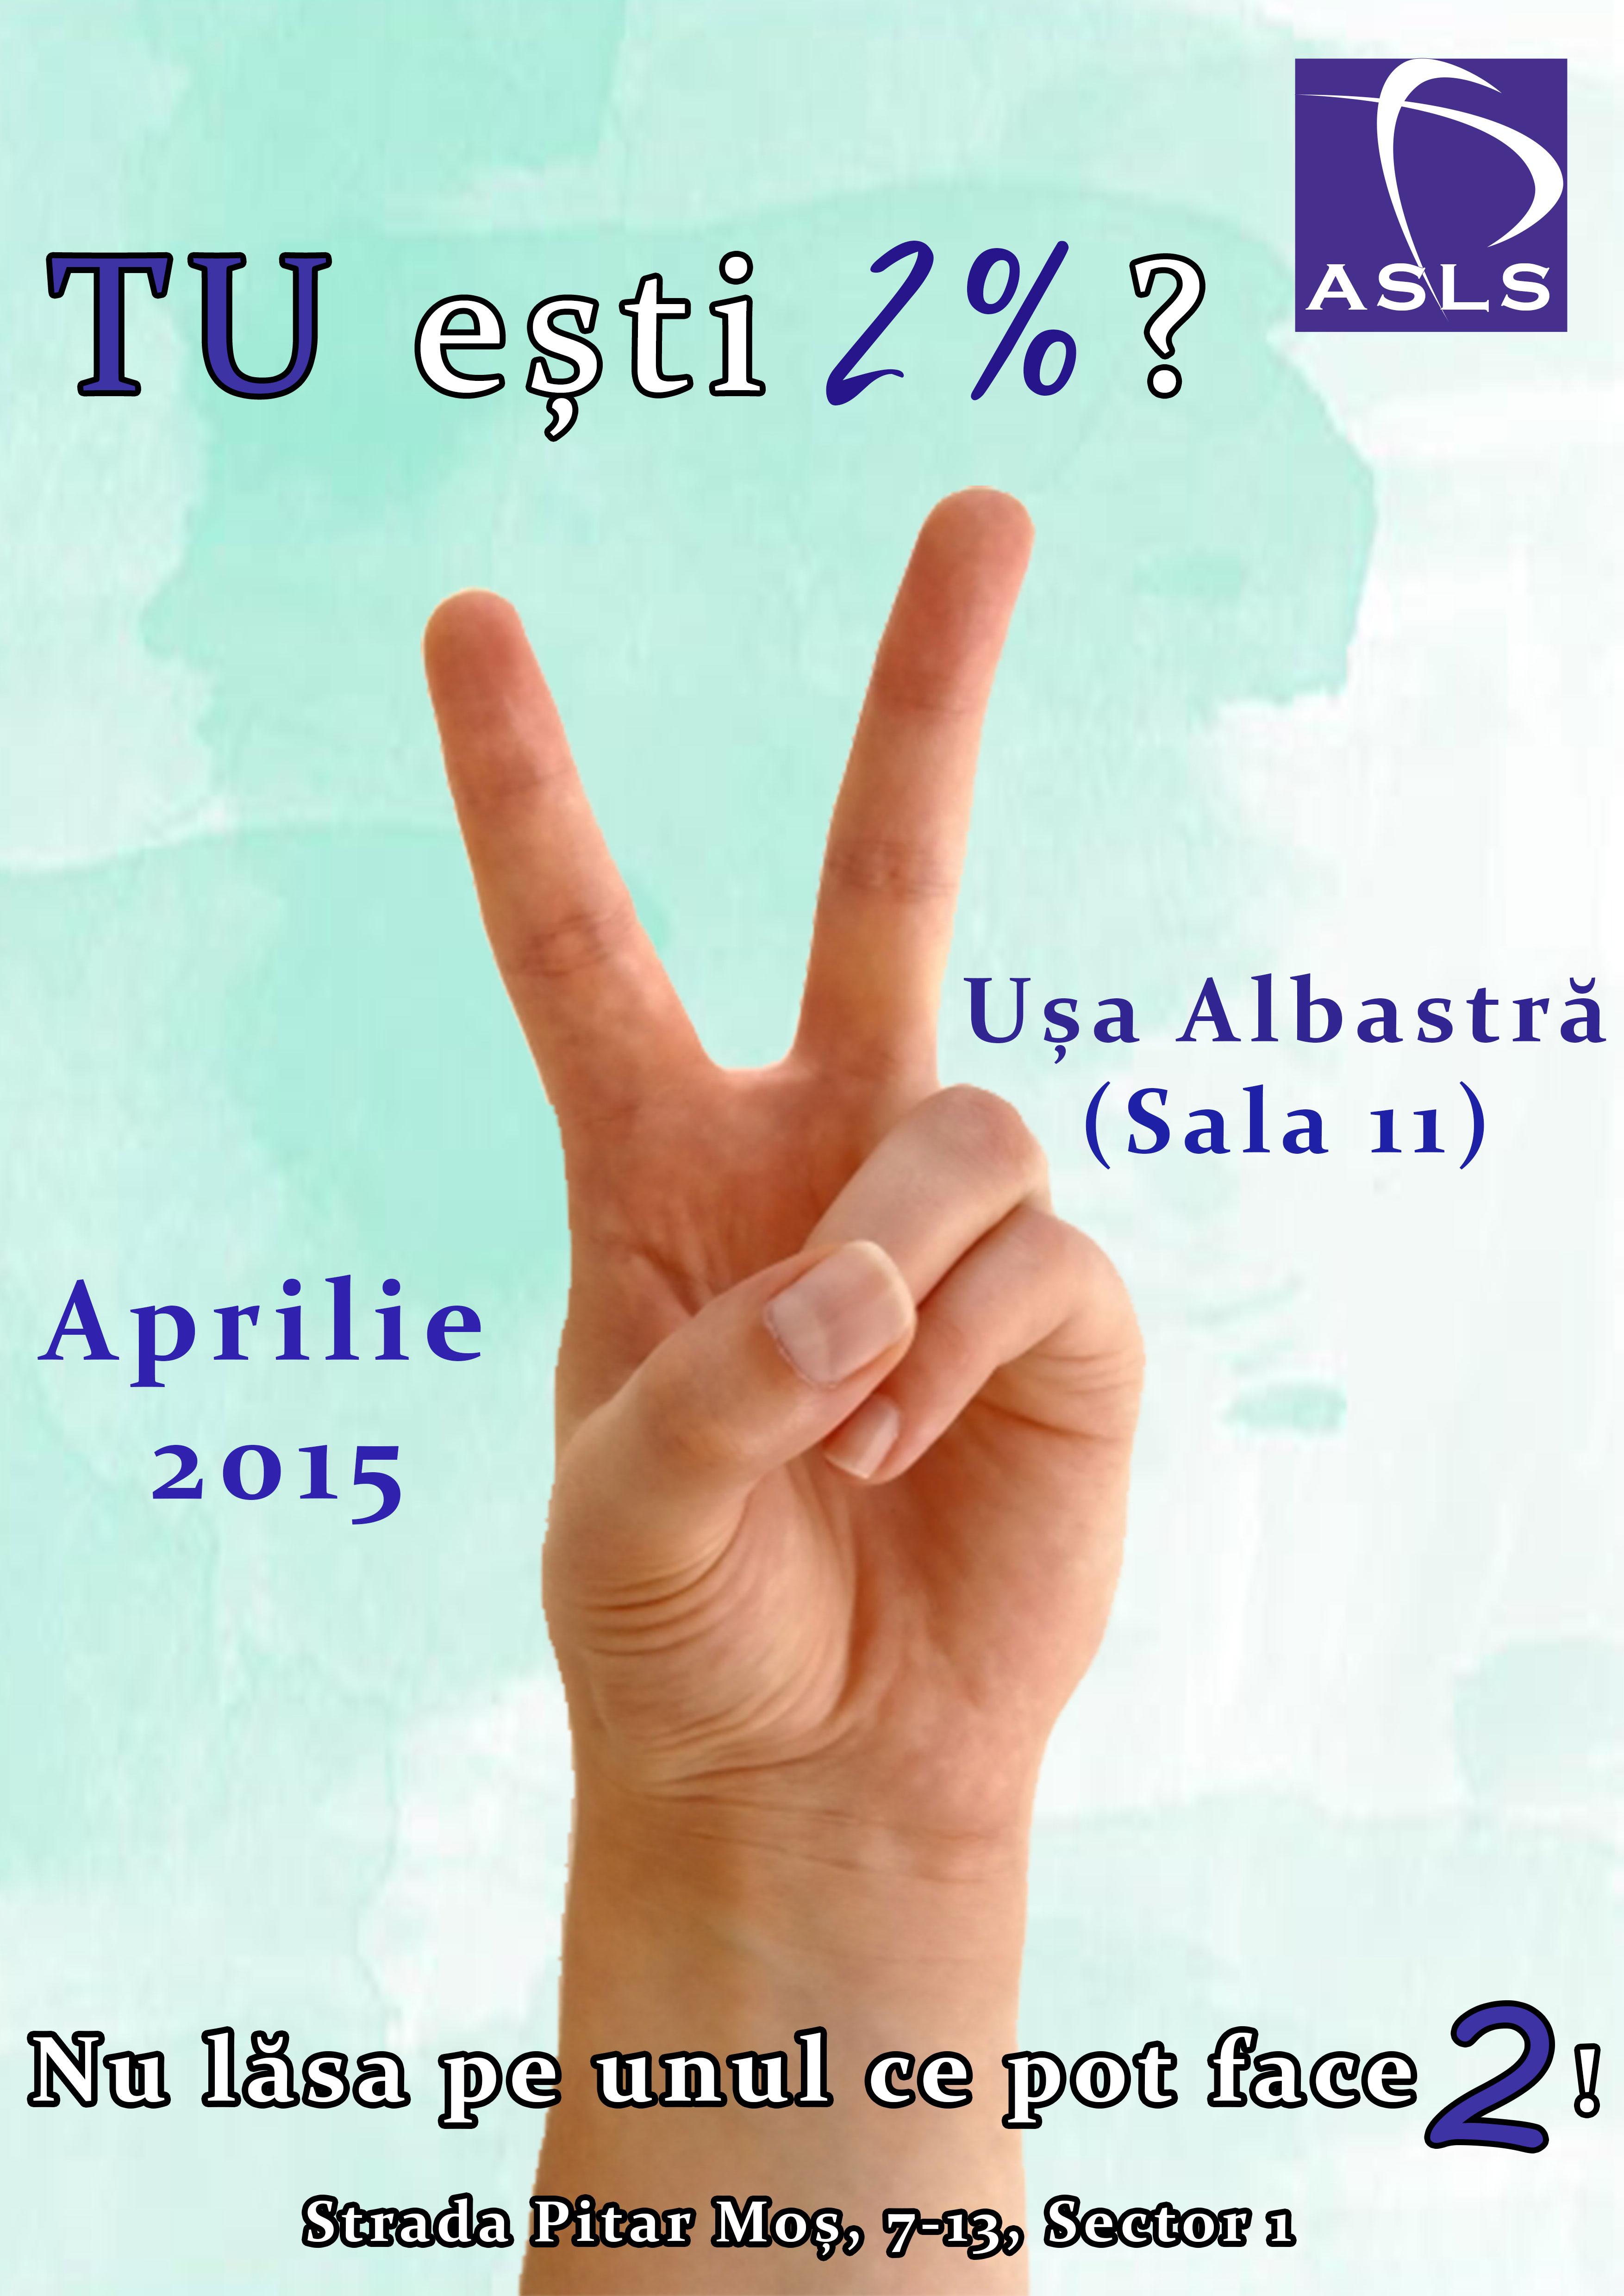 2% pentru ASLS!